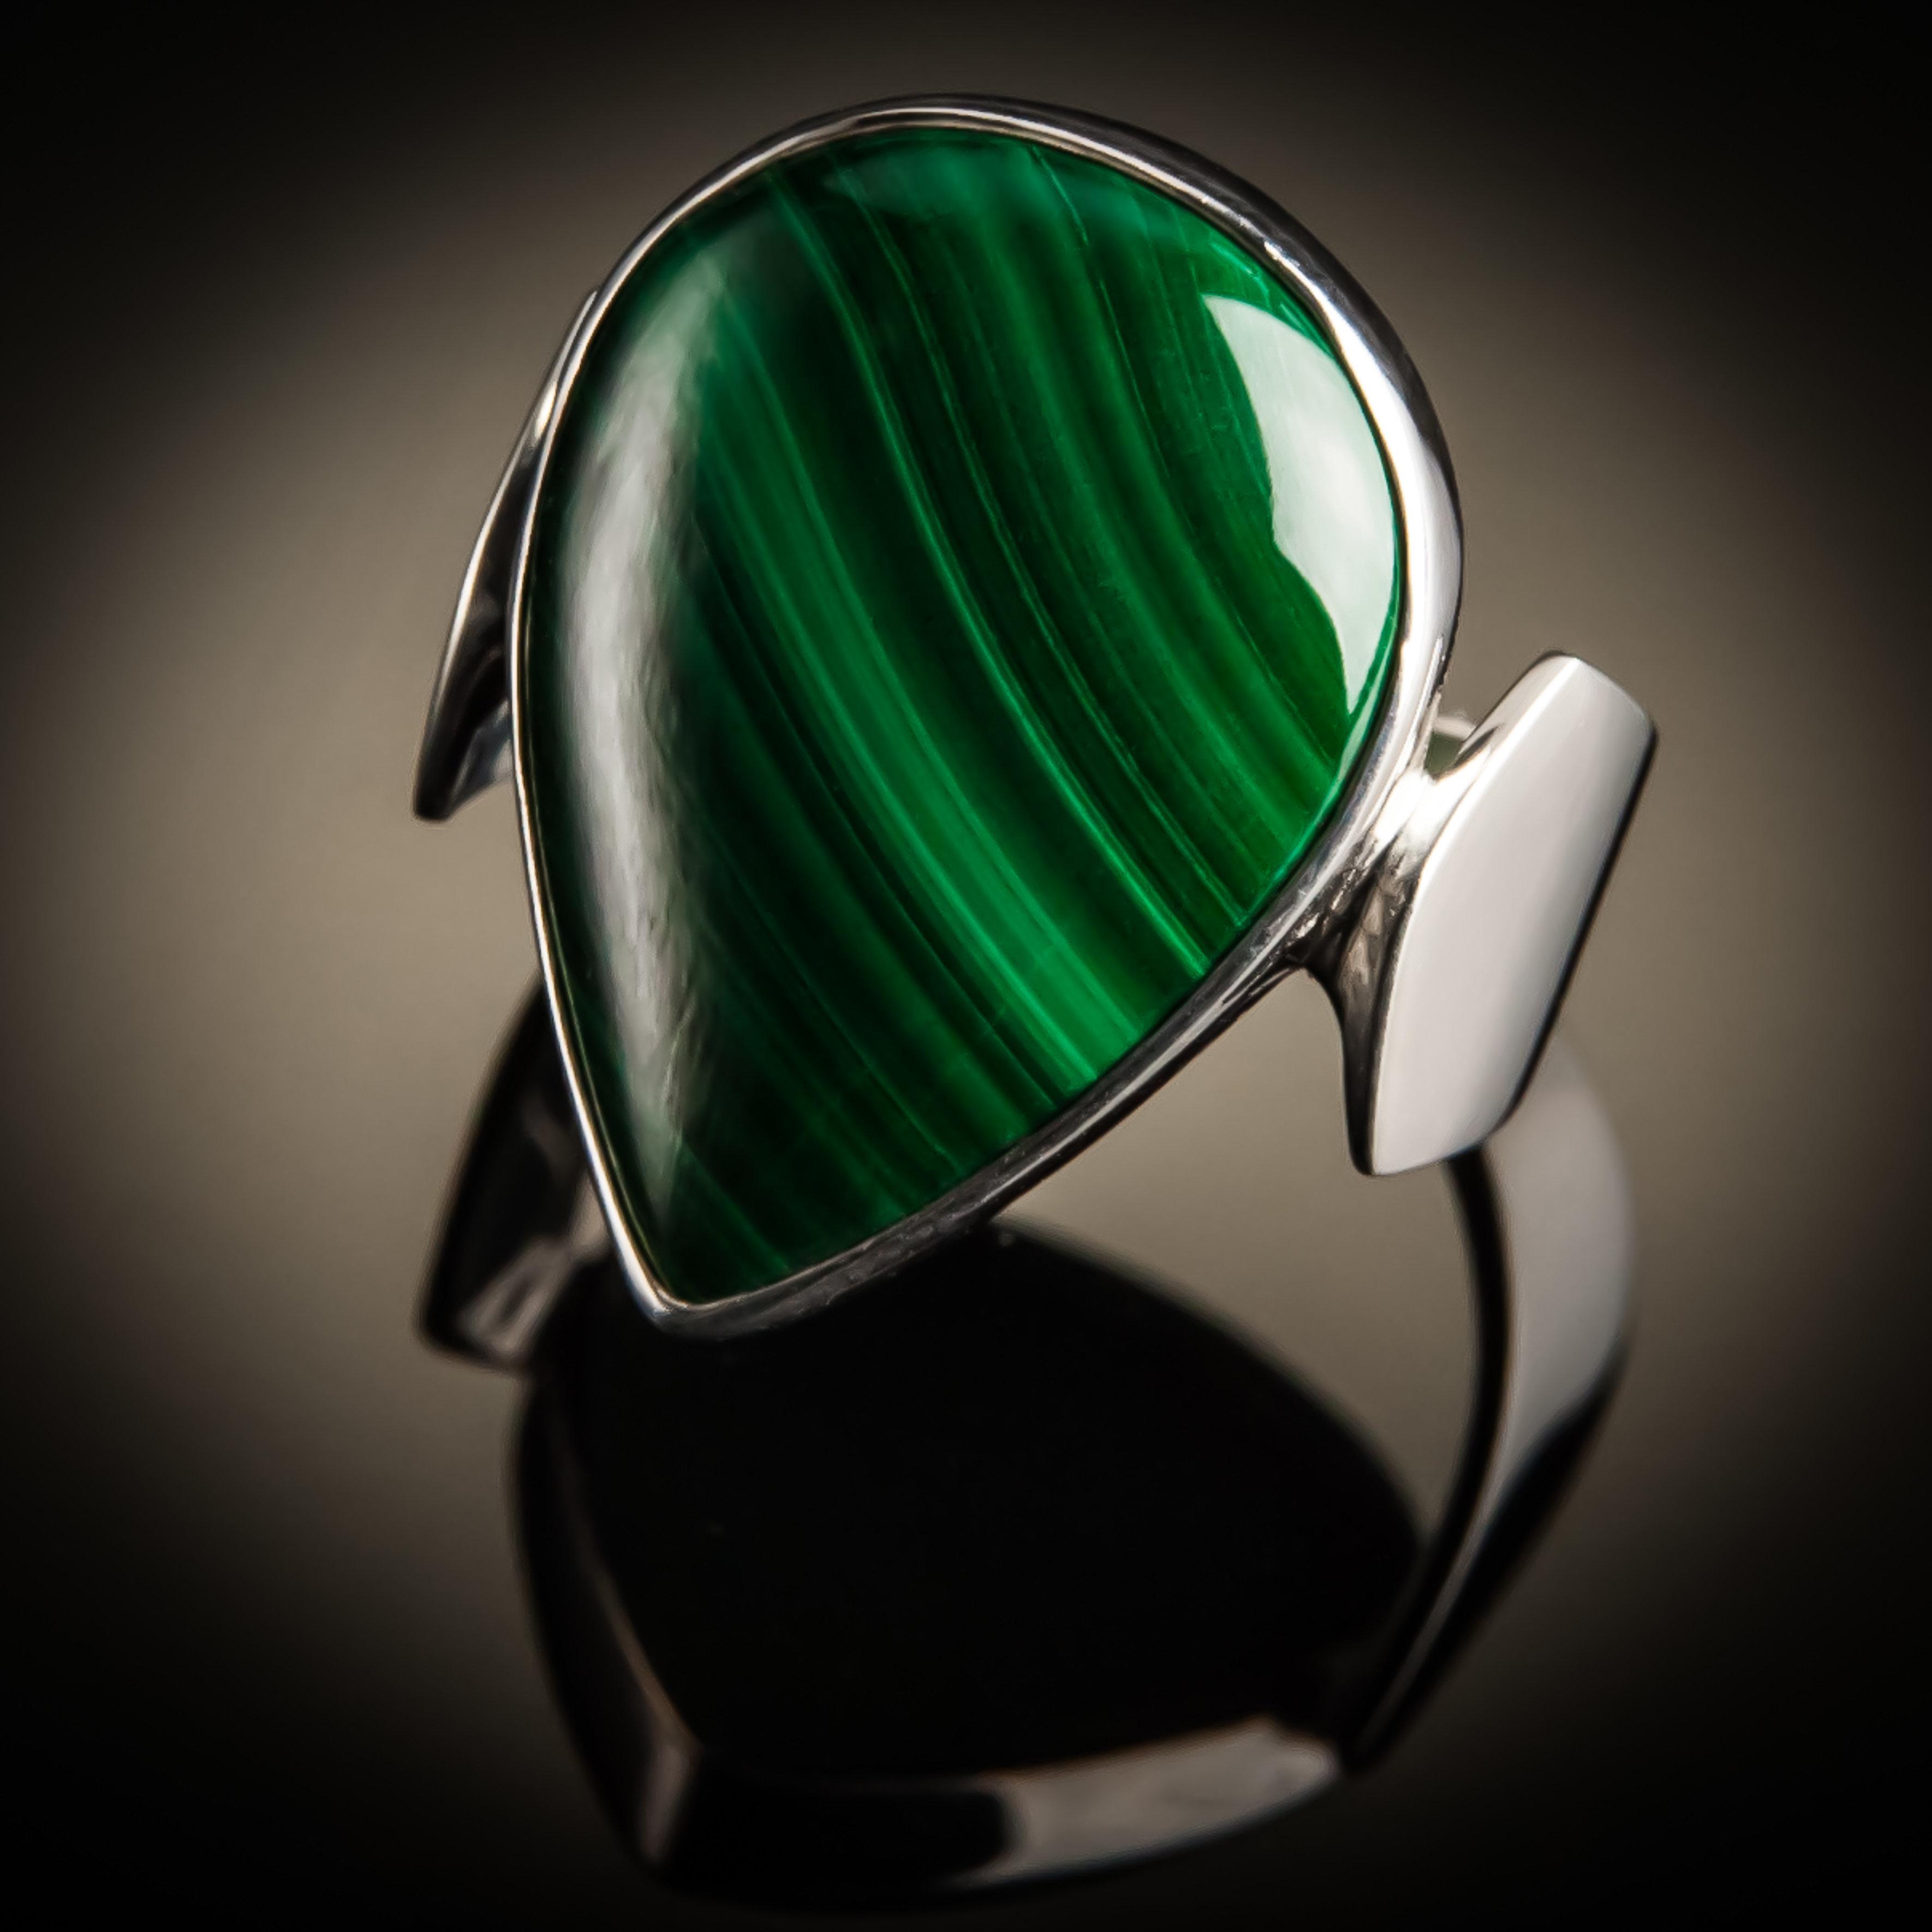 Malachite Teardrop Sterling Silver Ring R-09128-Lg-Malachite